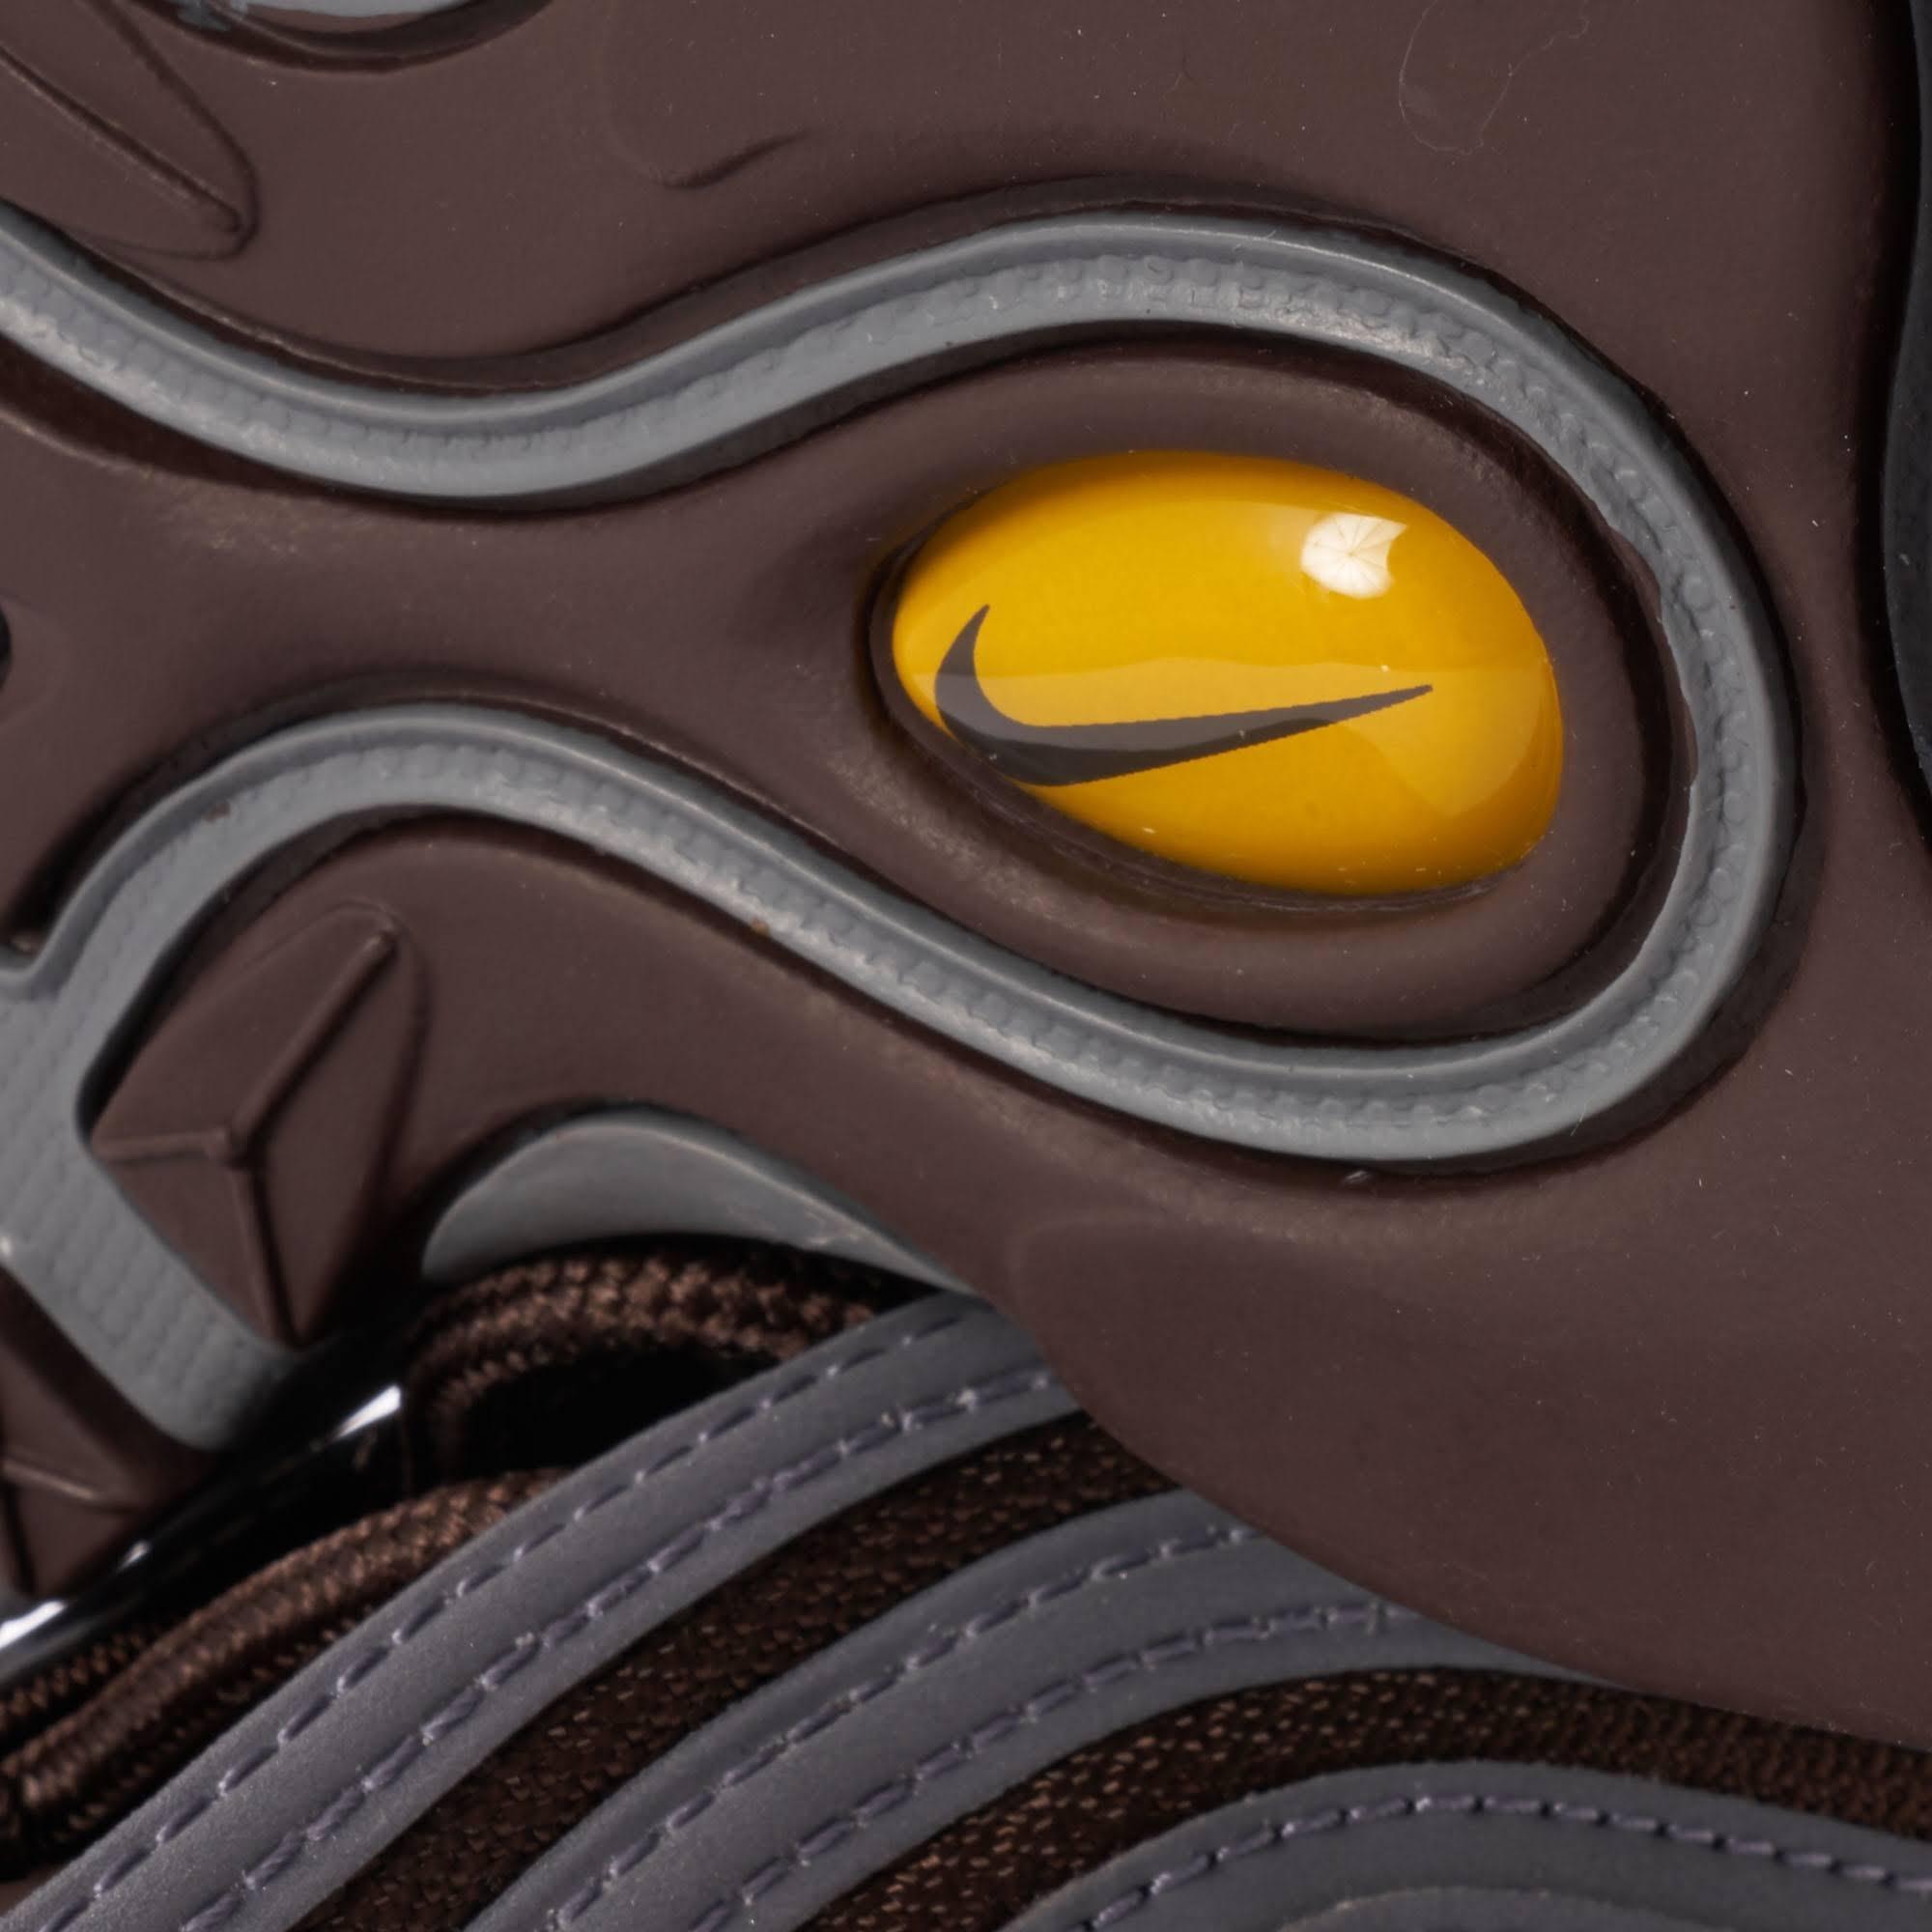 Max Air Premium Col 001 Av7025 Nike Grey Cool Baroque 97 amp; Brown qO4xnT5w7